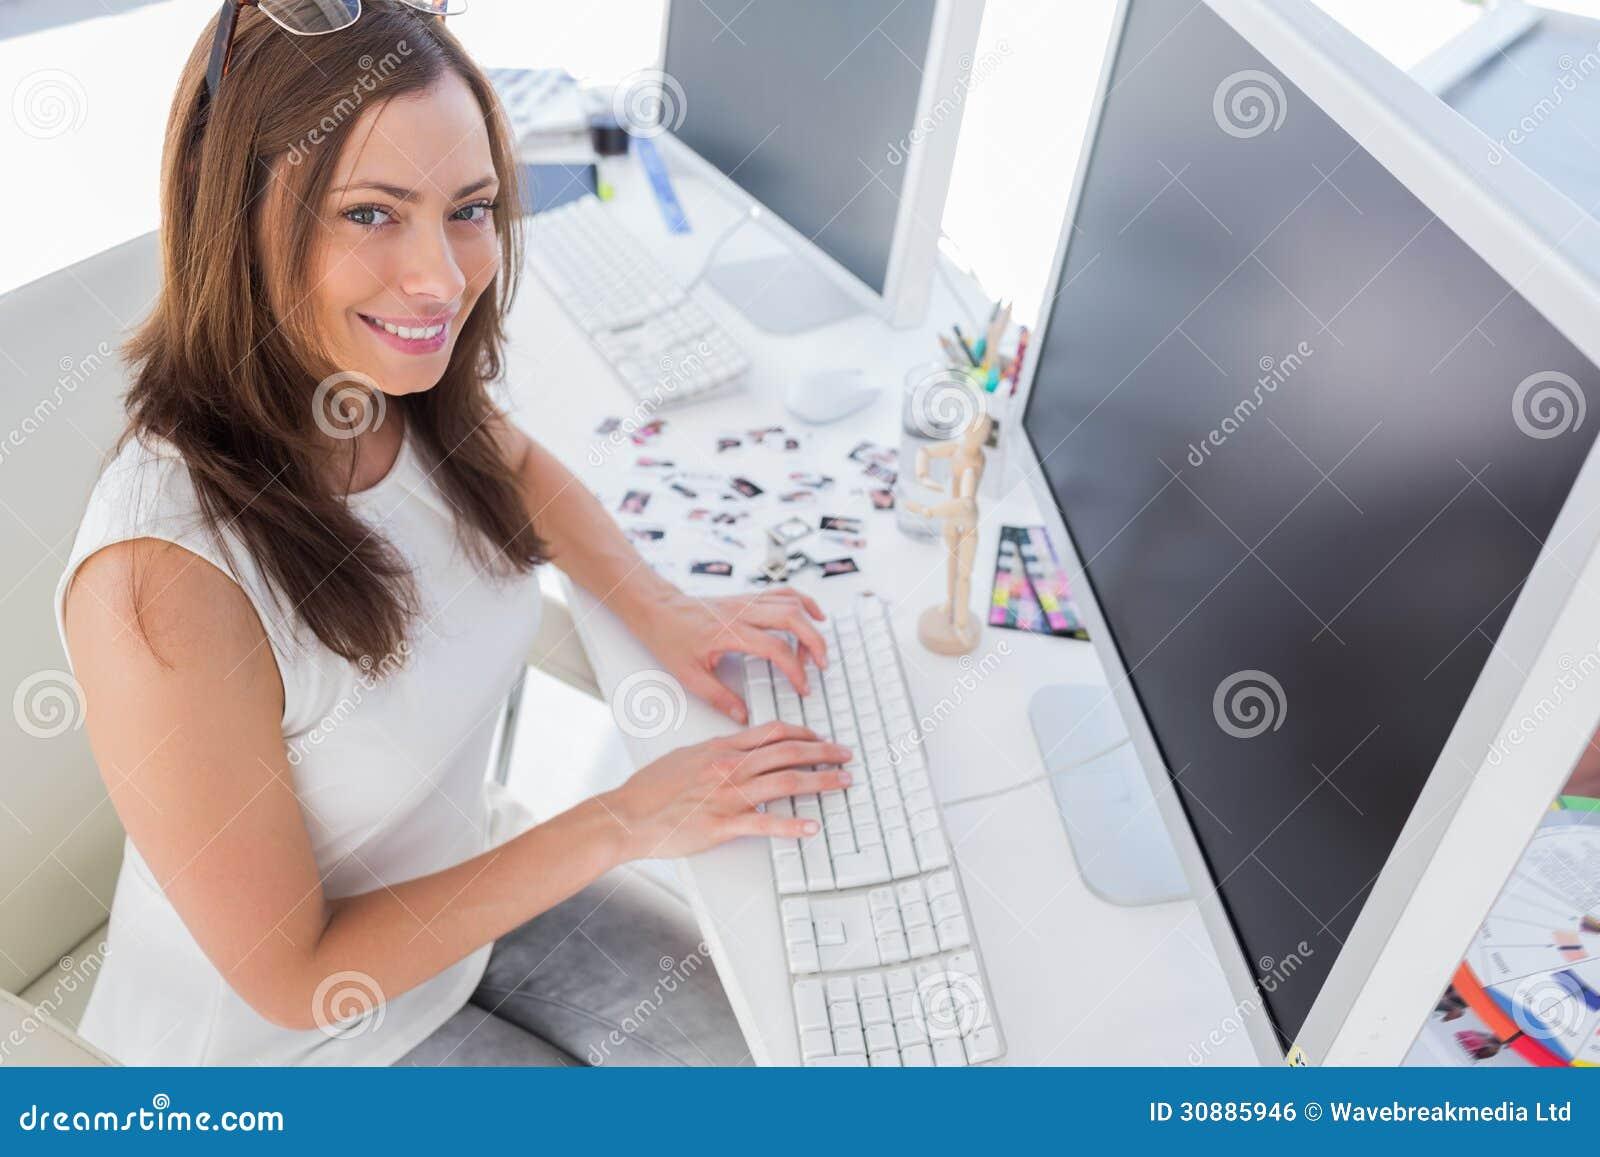 Smiling photo editor at work